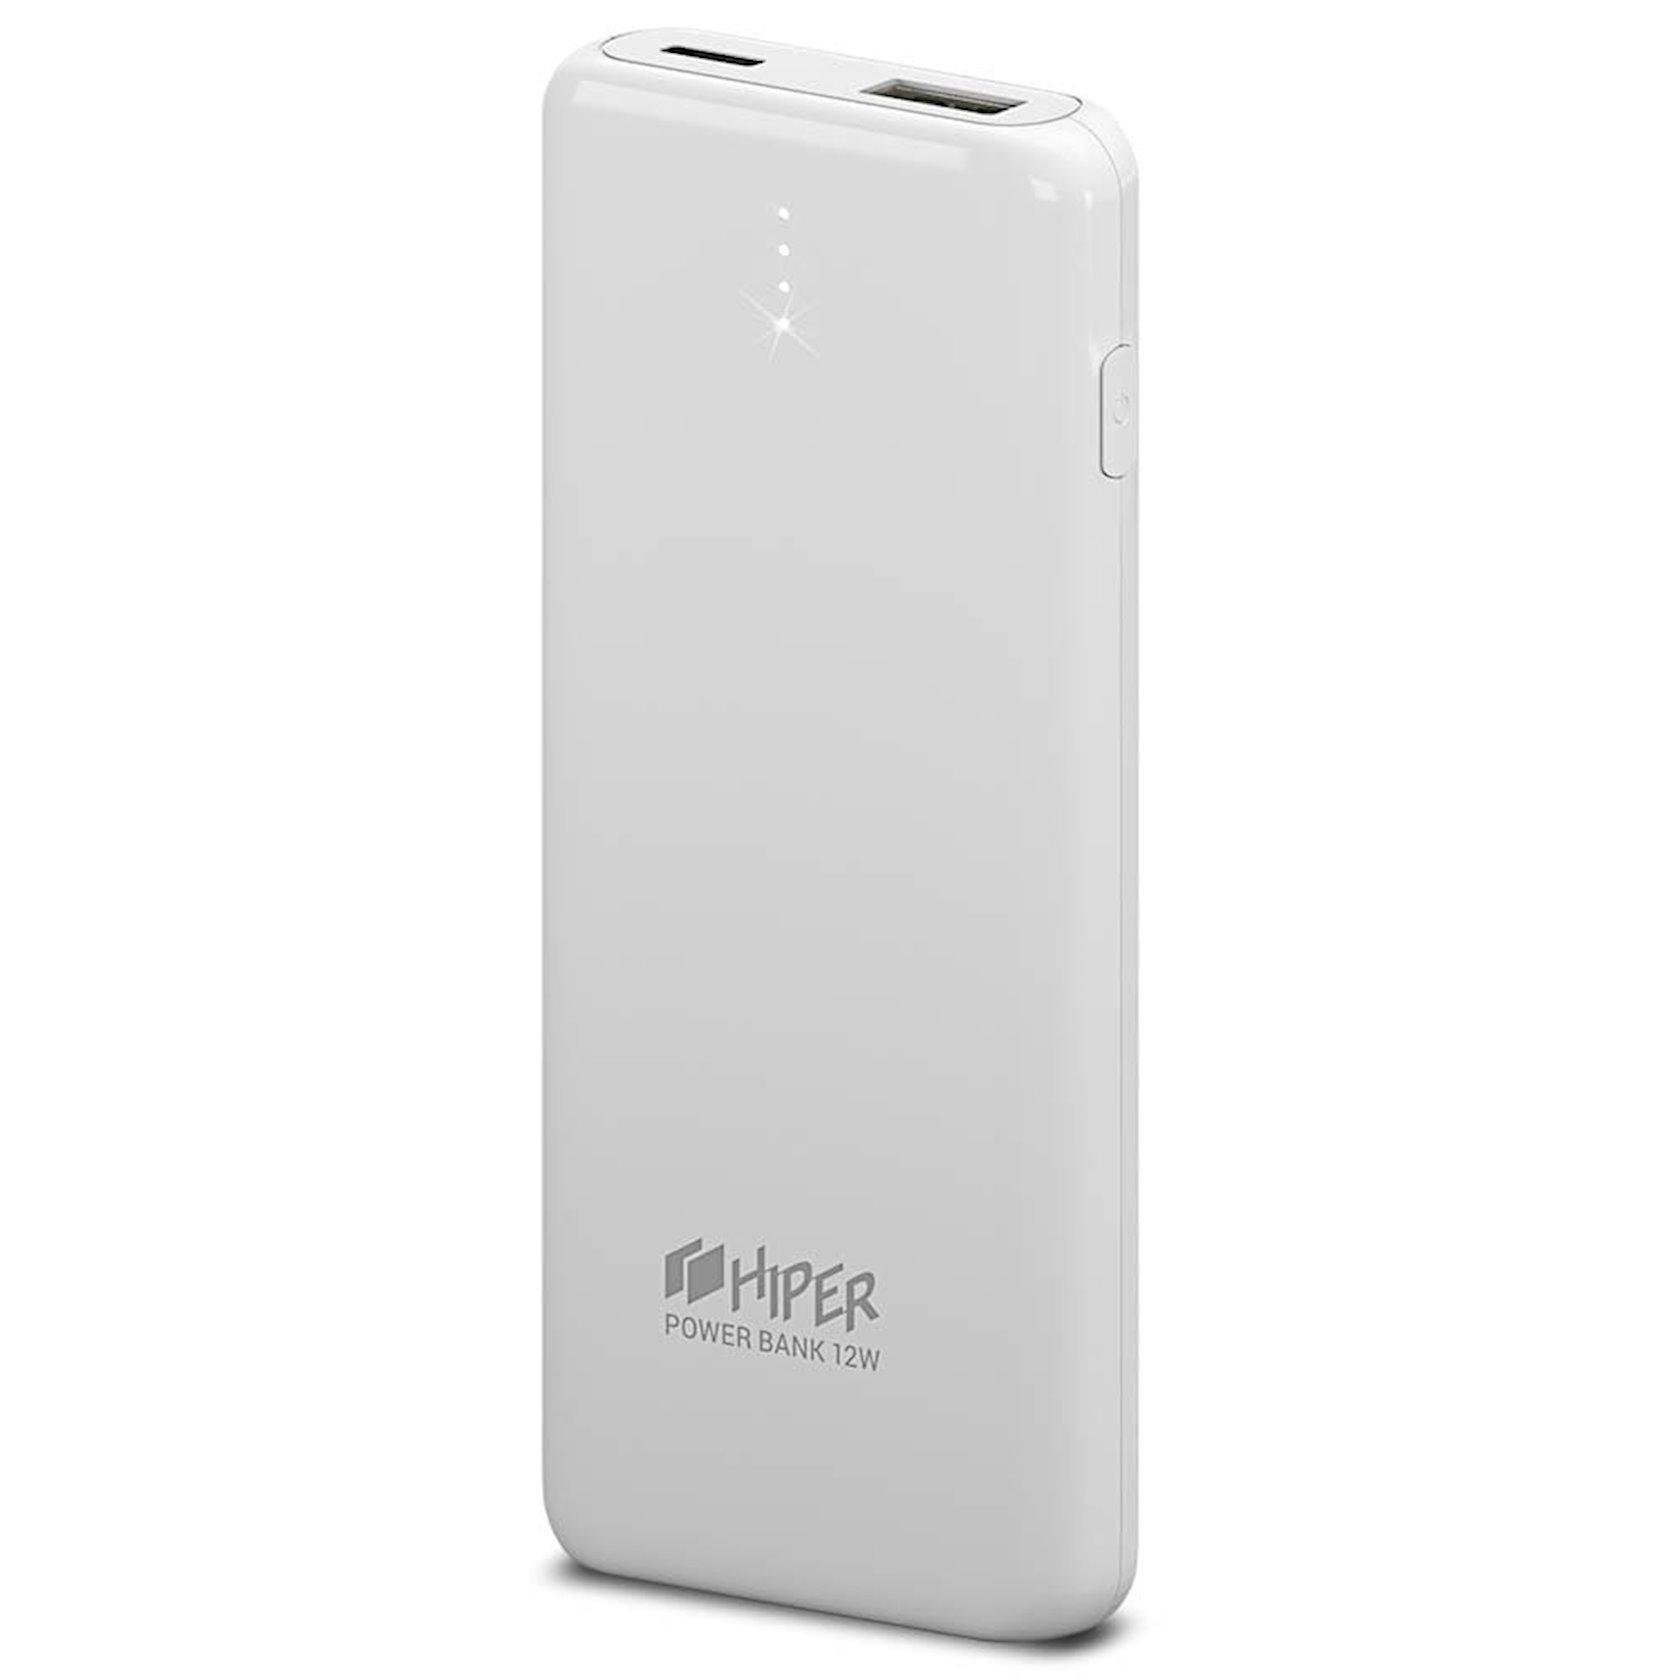 Xarici akkumulyator Hiper Power Bank 8000 mA/saat PSL8000 White